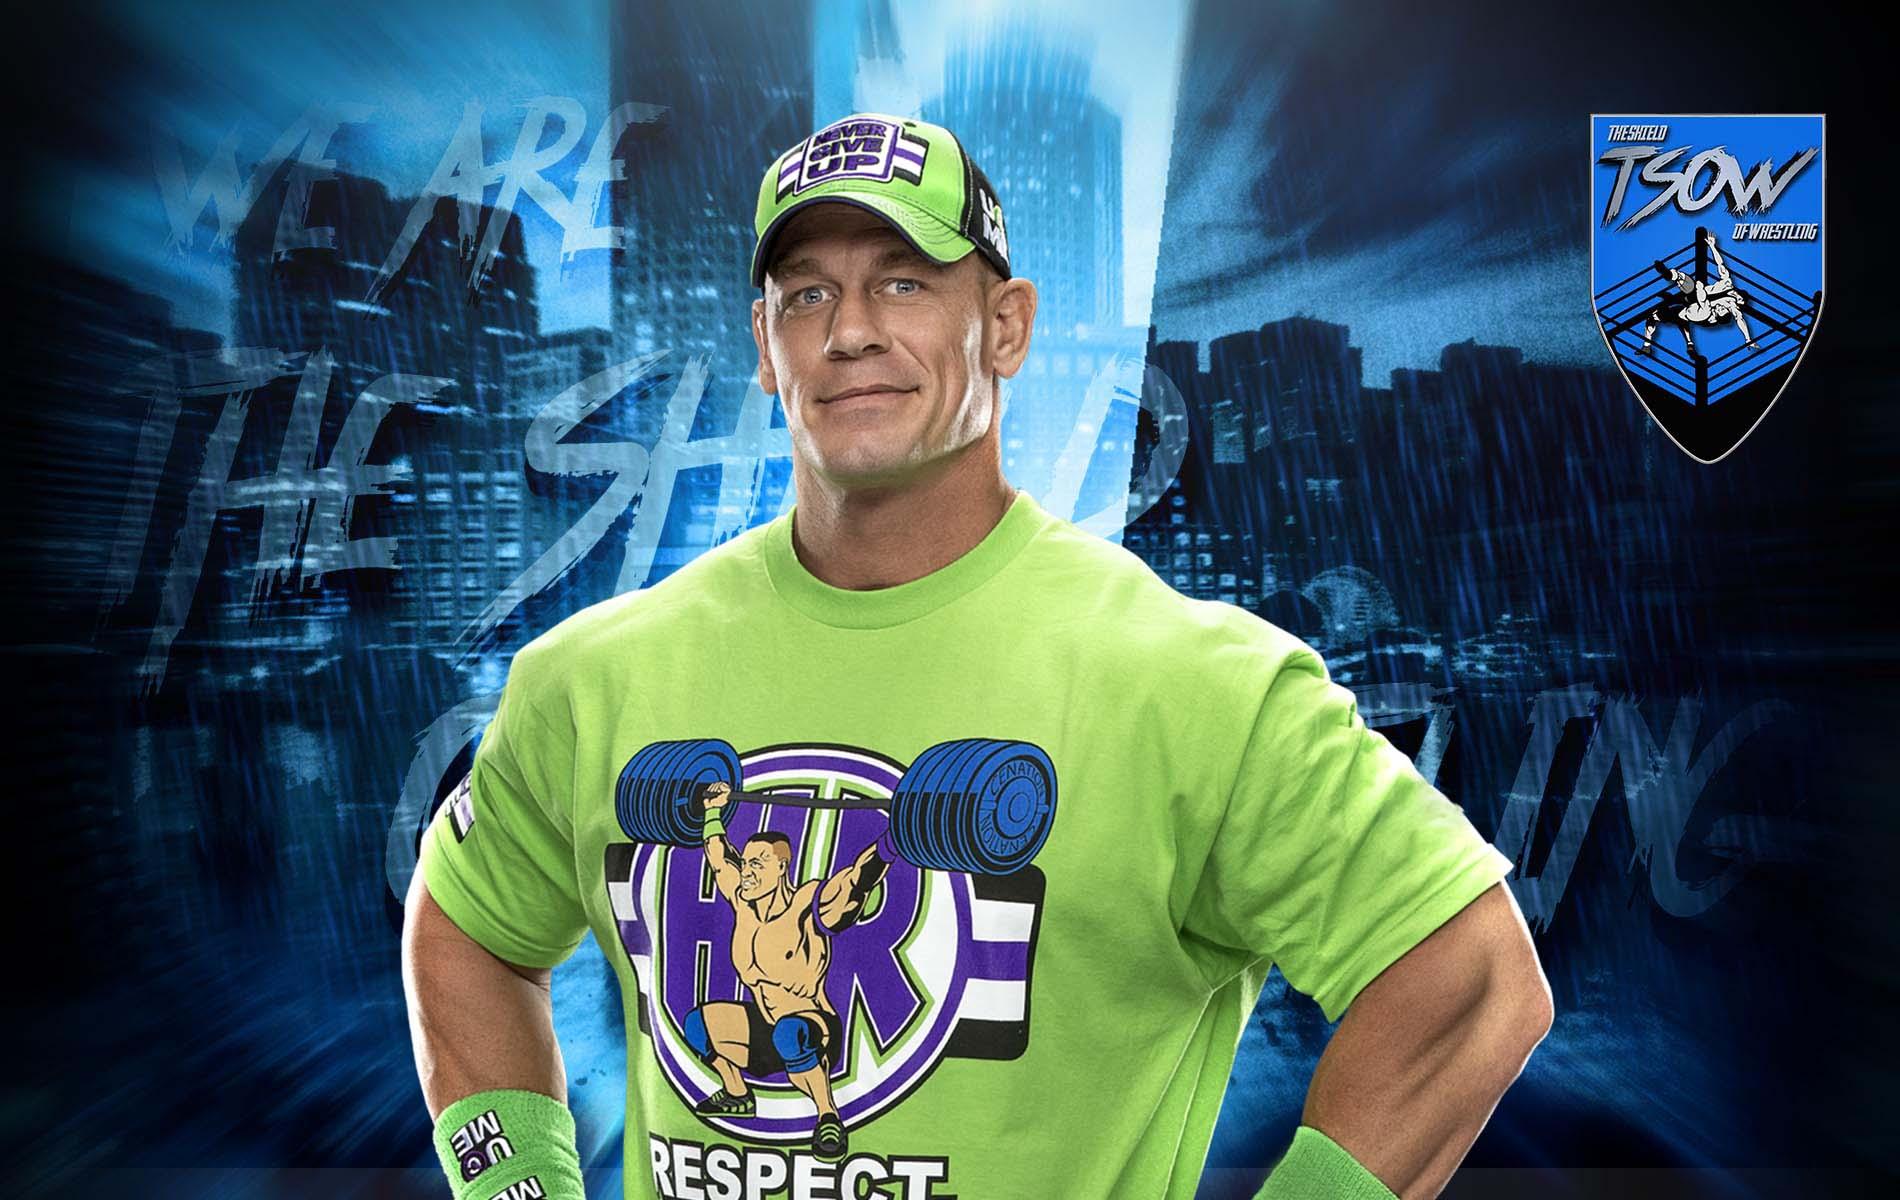 John Cena sarà All Might di My Hero Academia?